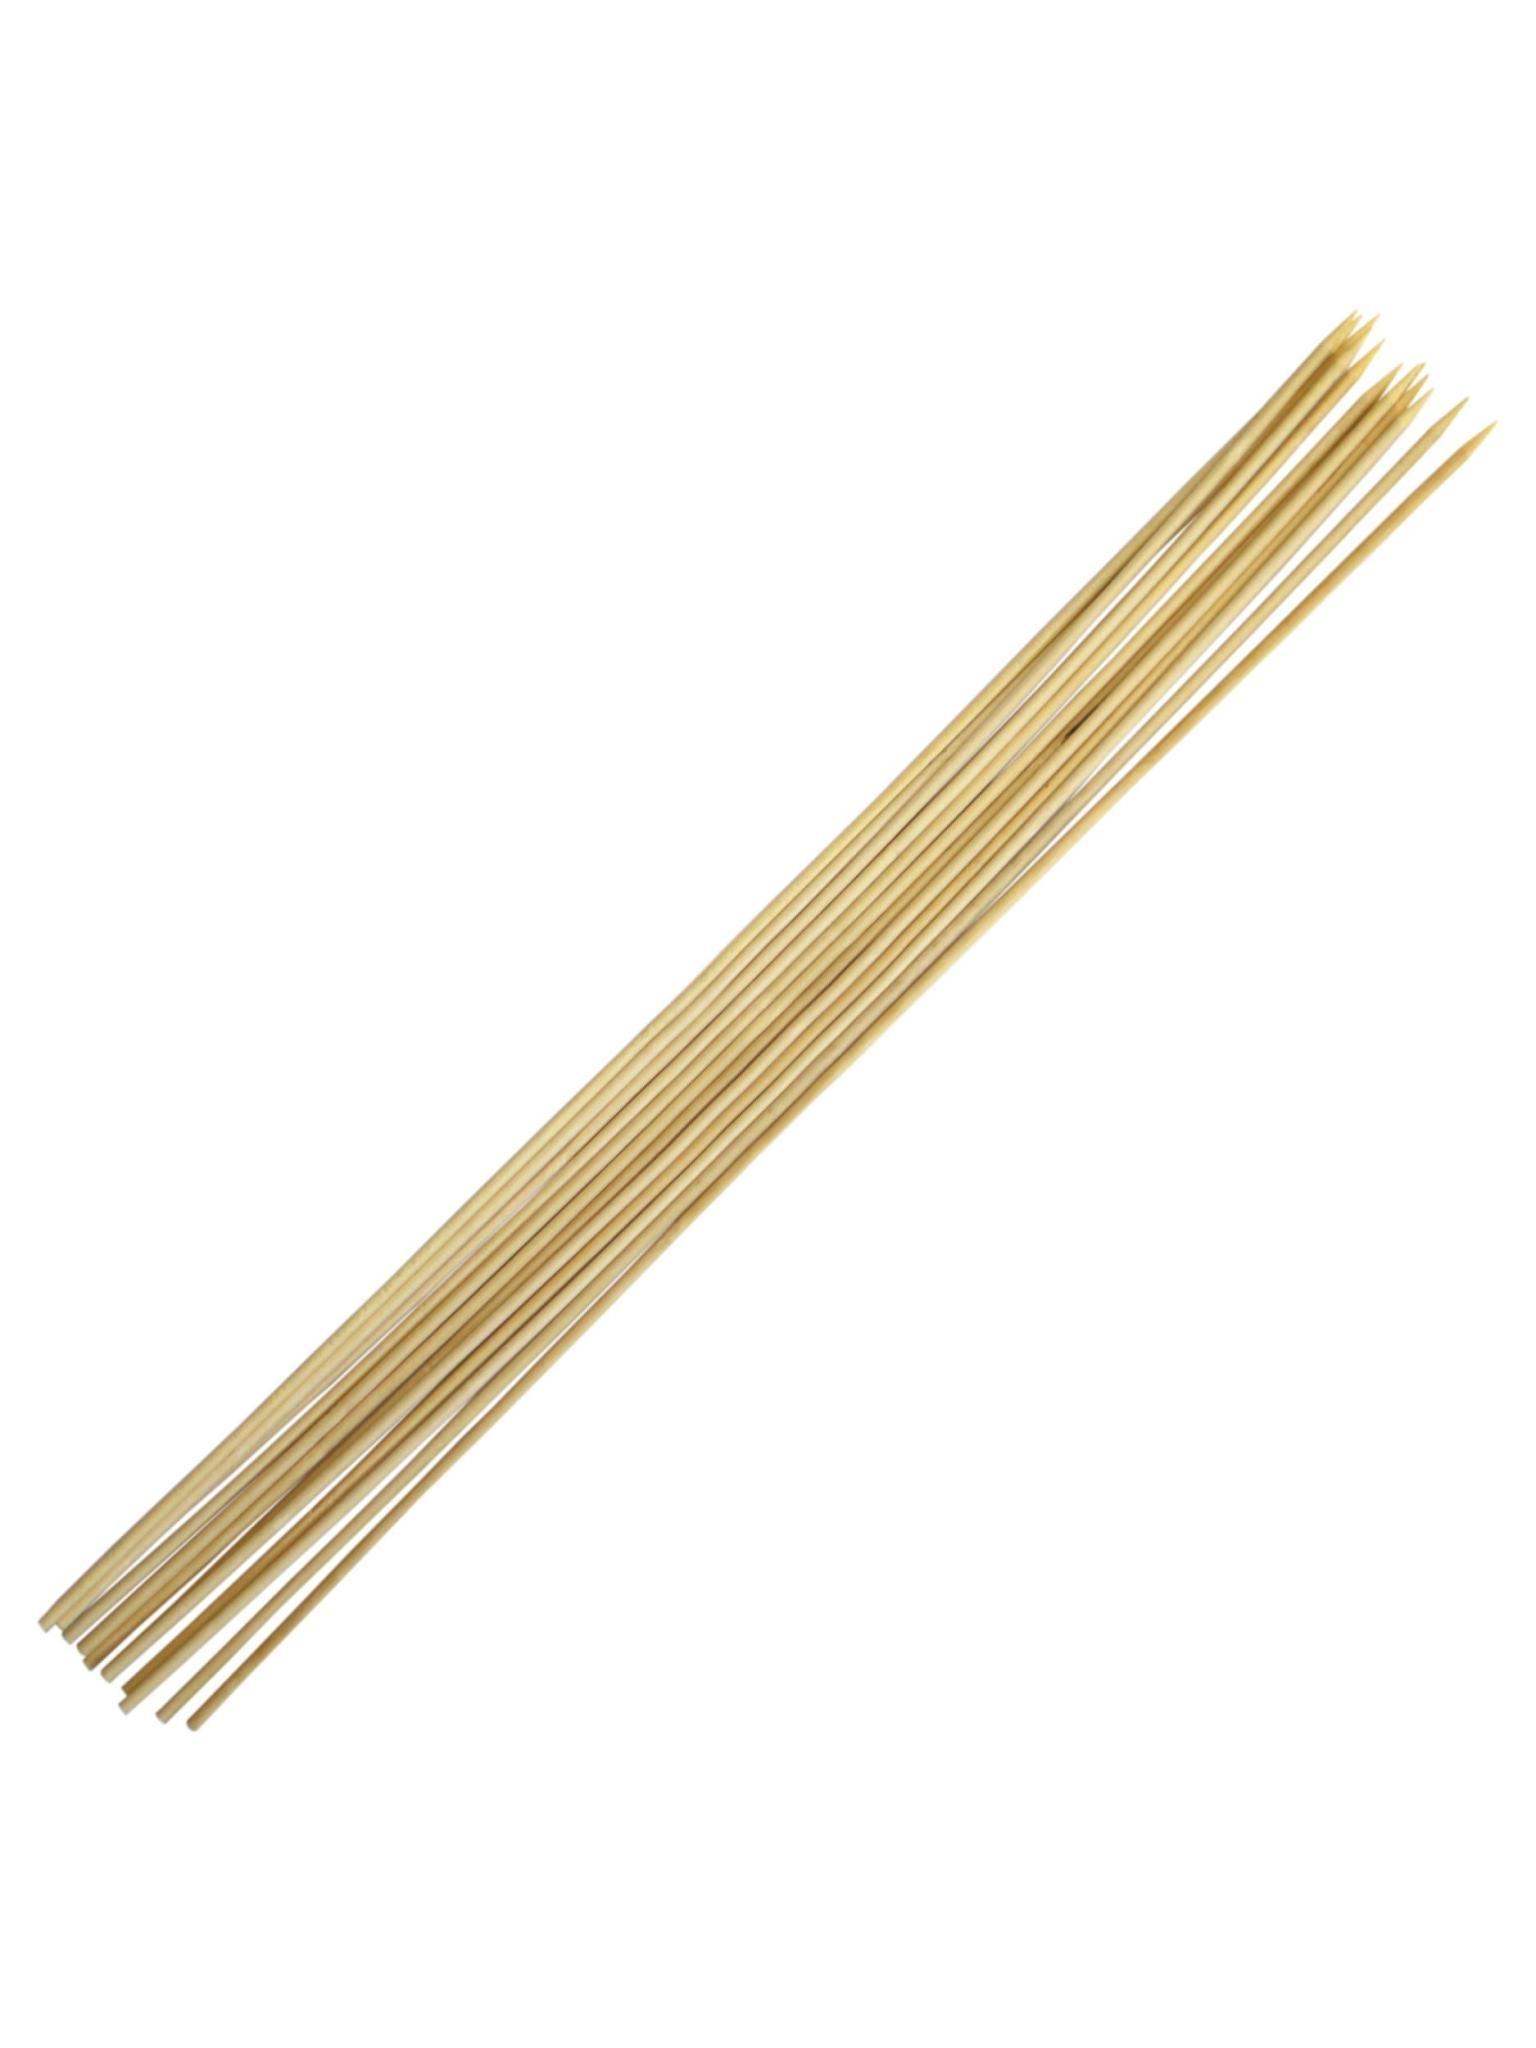 Coghlan's Bamboo Roasting Sticks